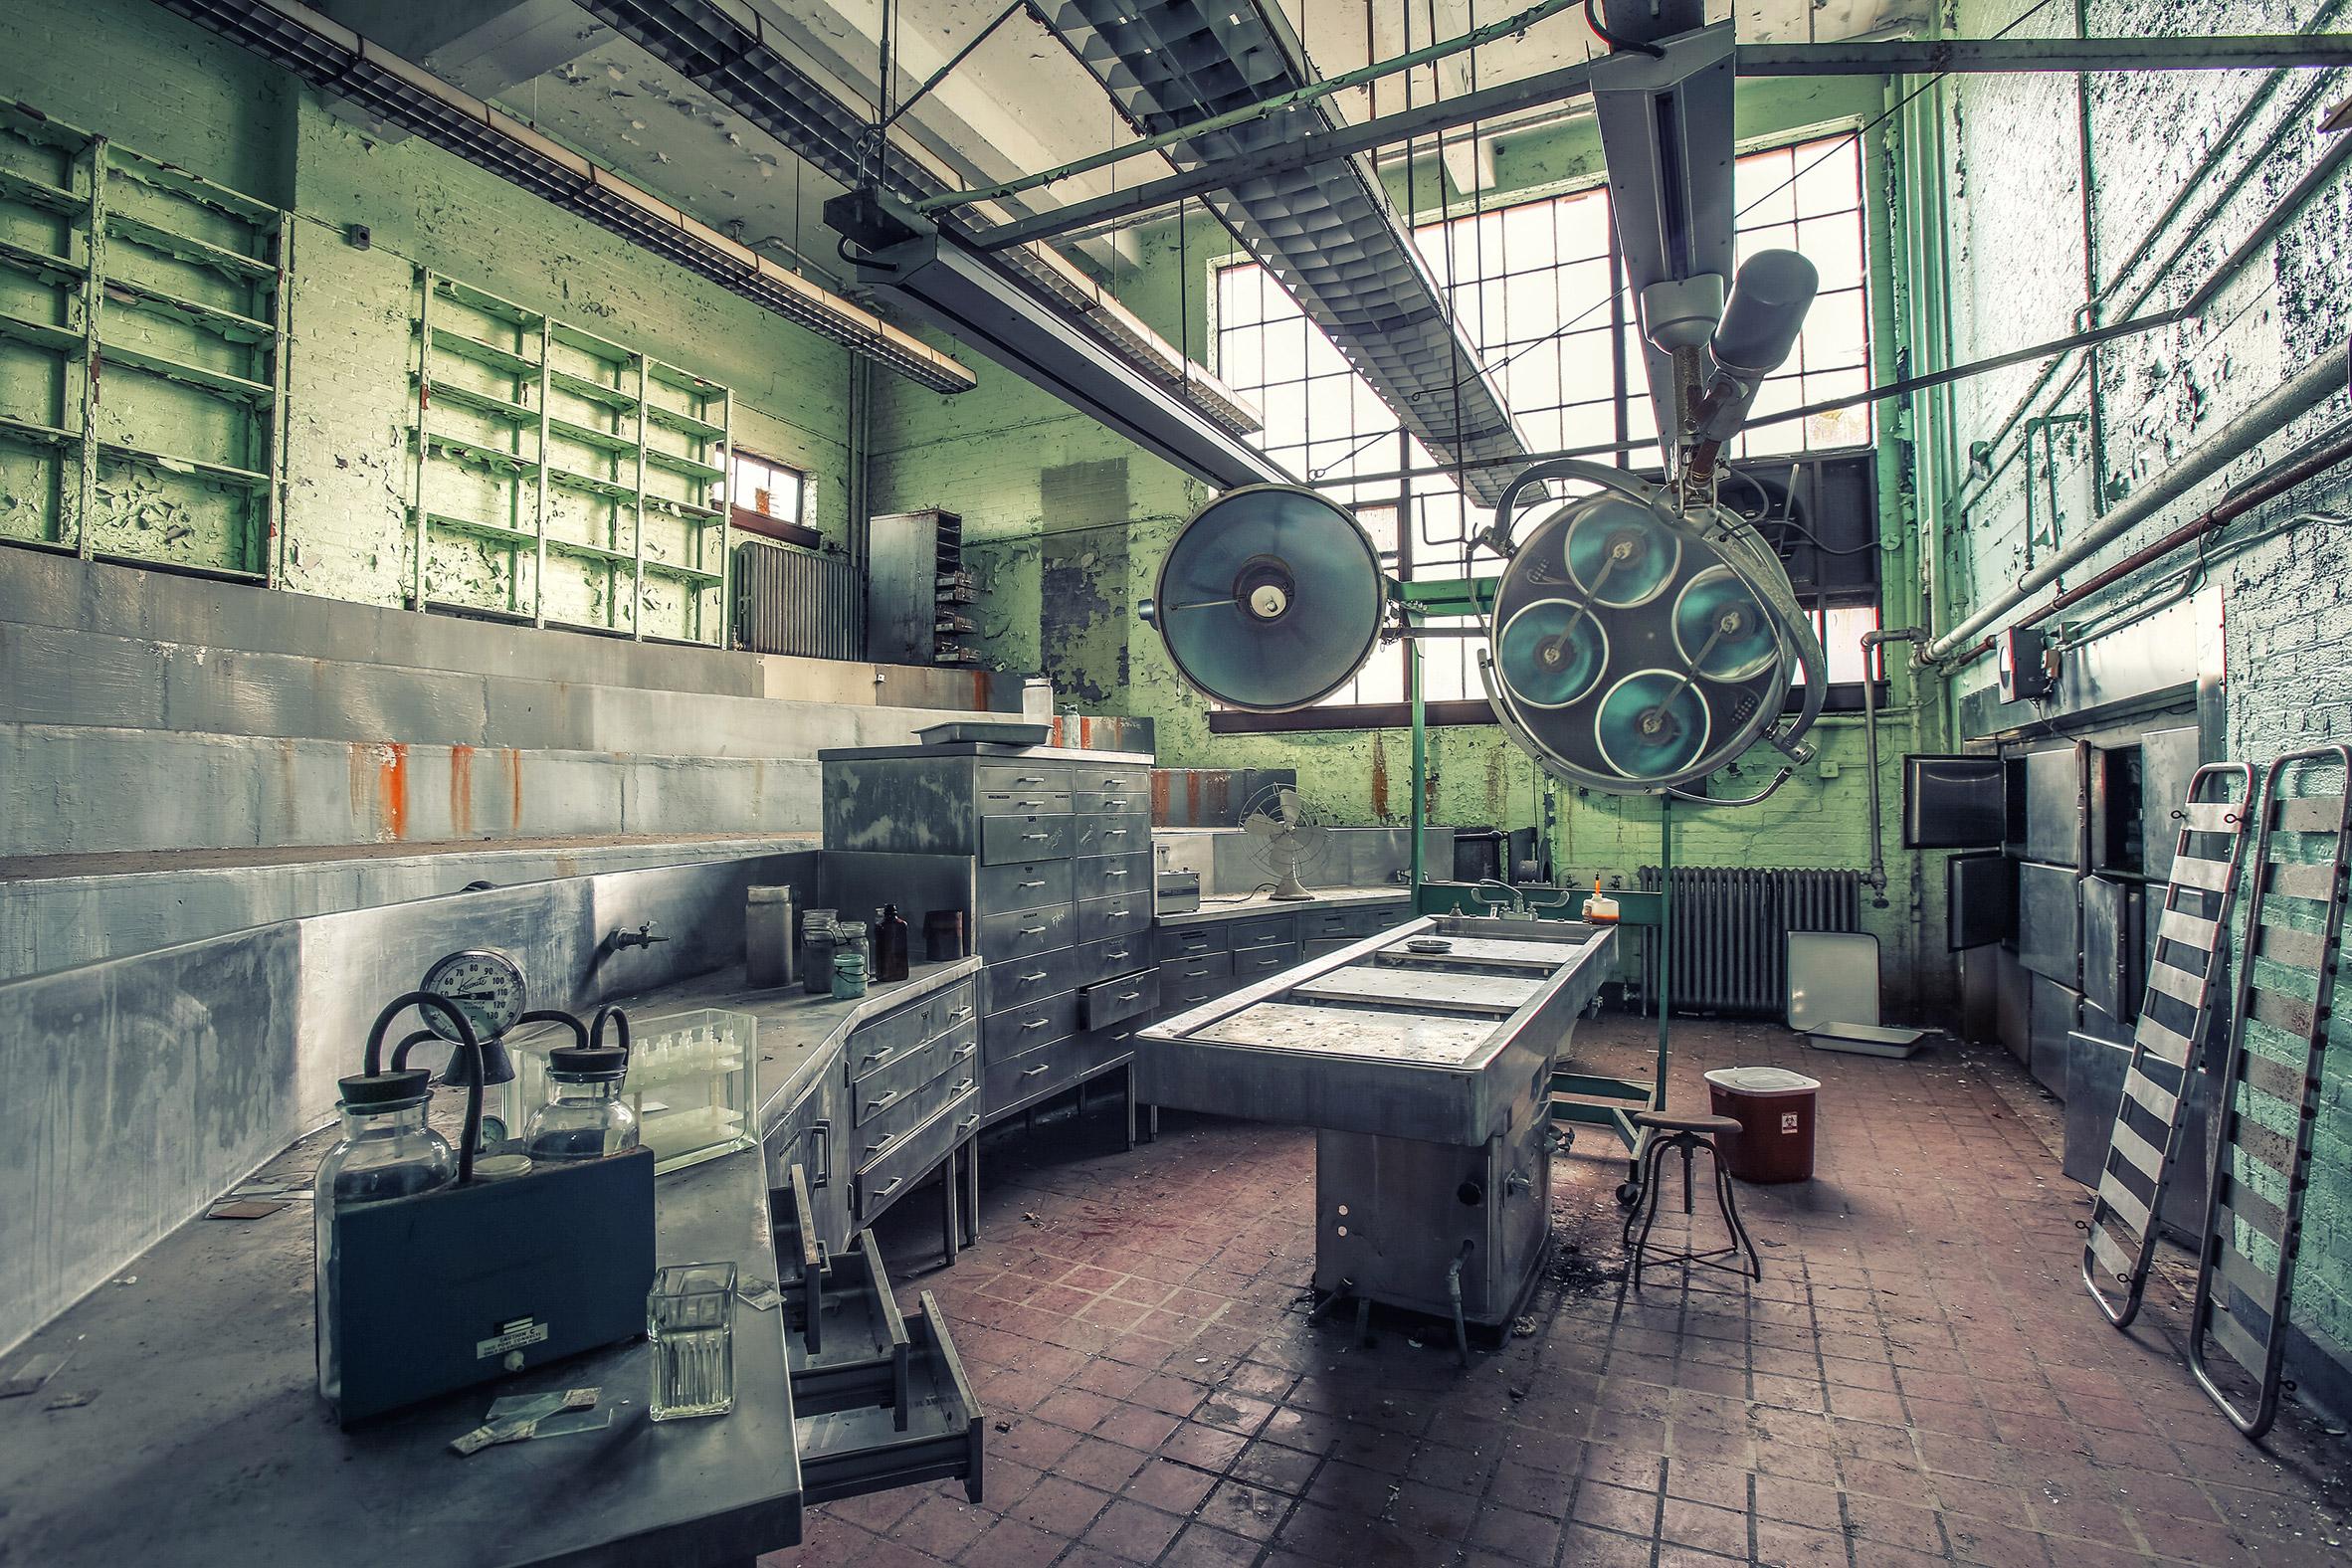 Abandoned-Asylums-9.jpg